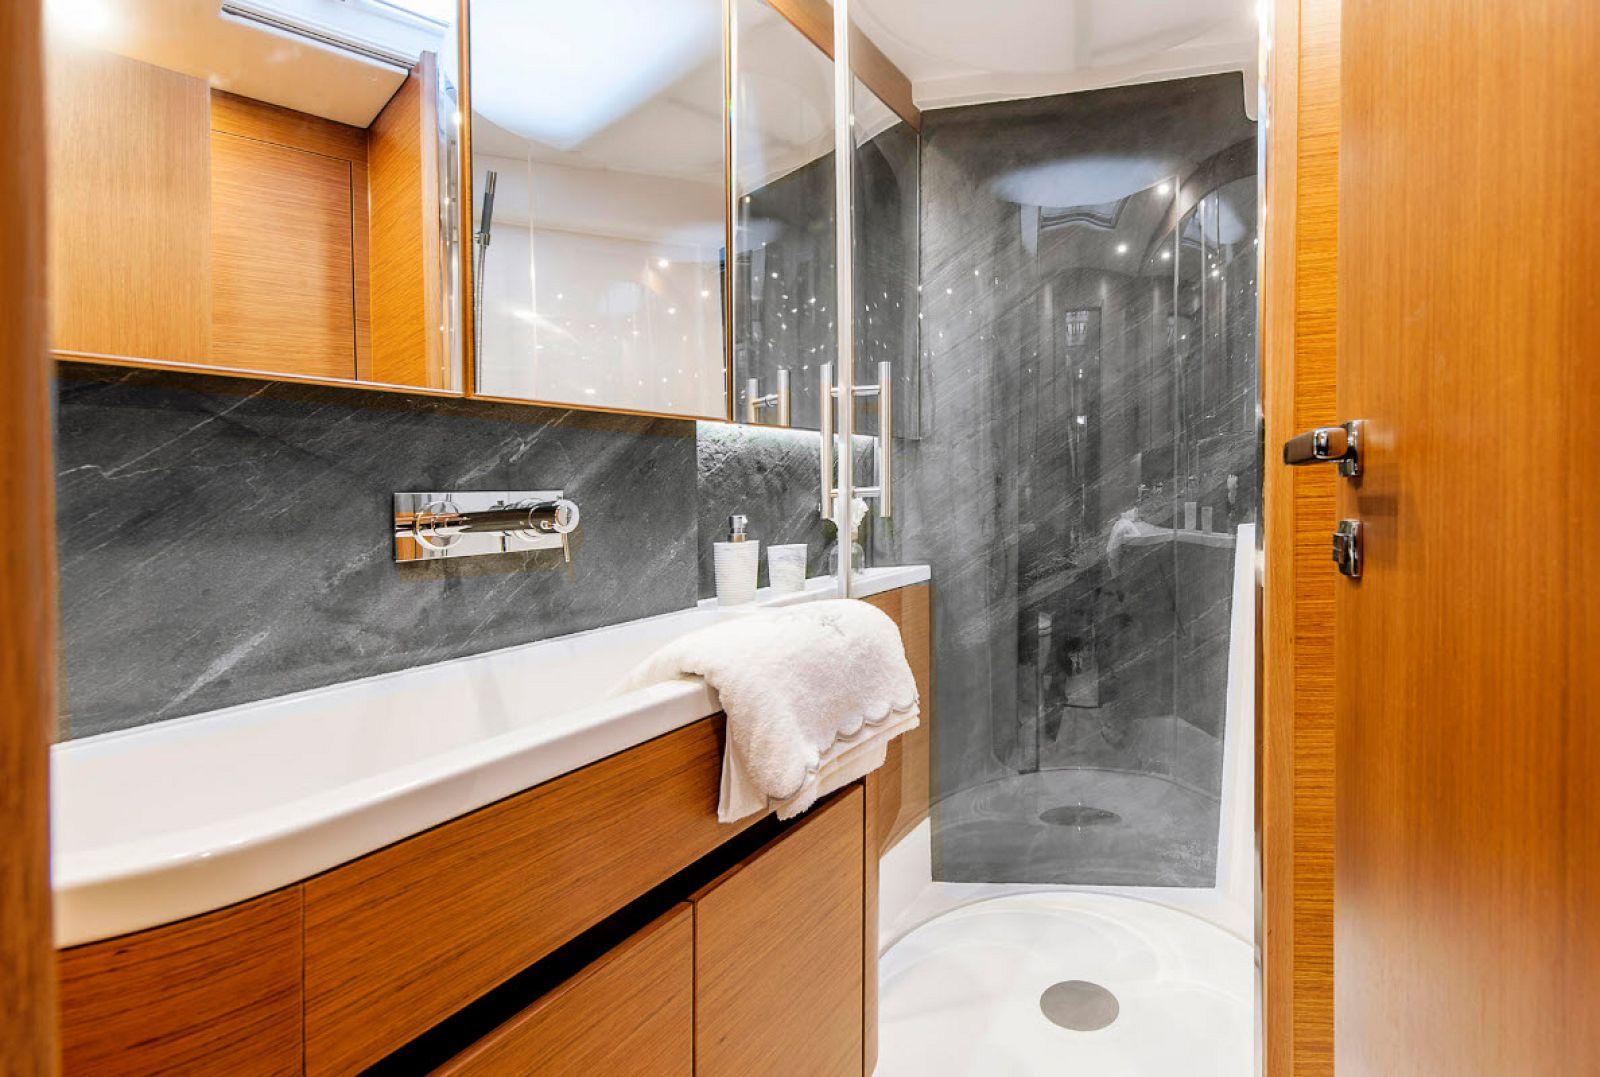 Master Bathroom and Sink